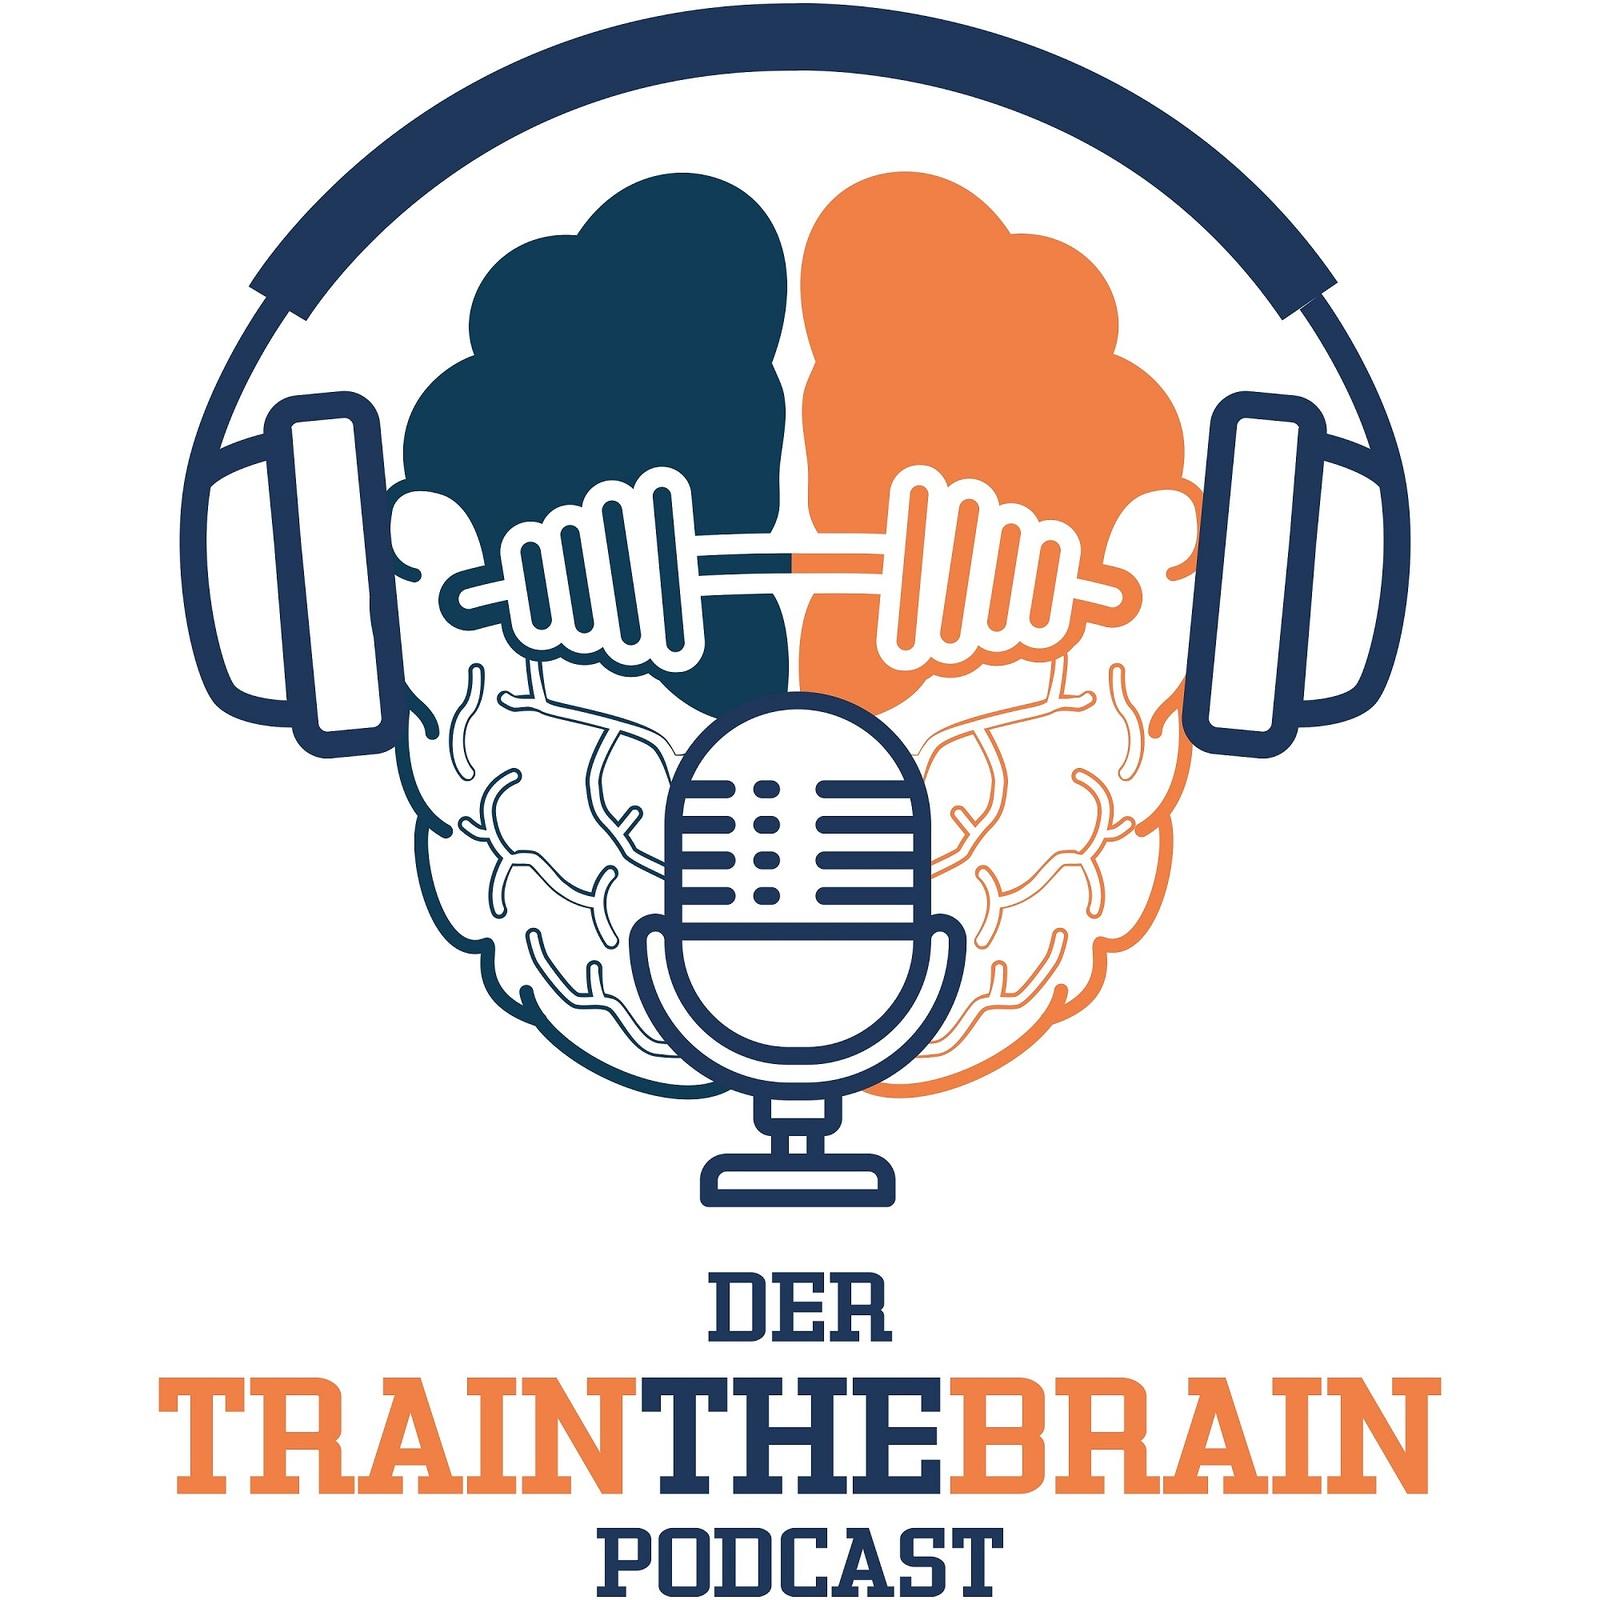 Der trainthebrain Podcast show art